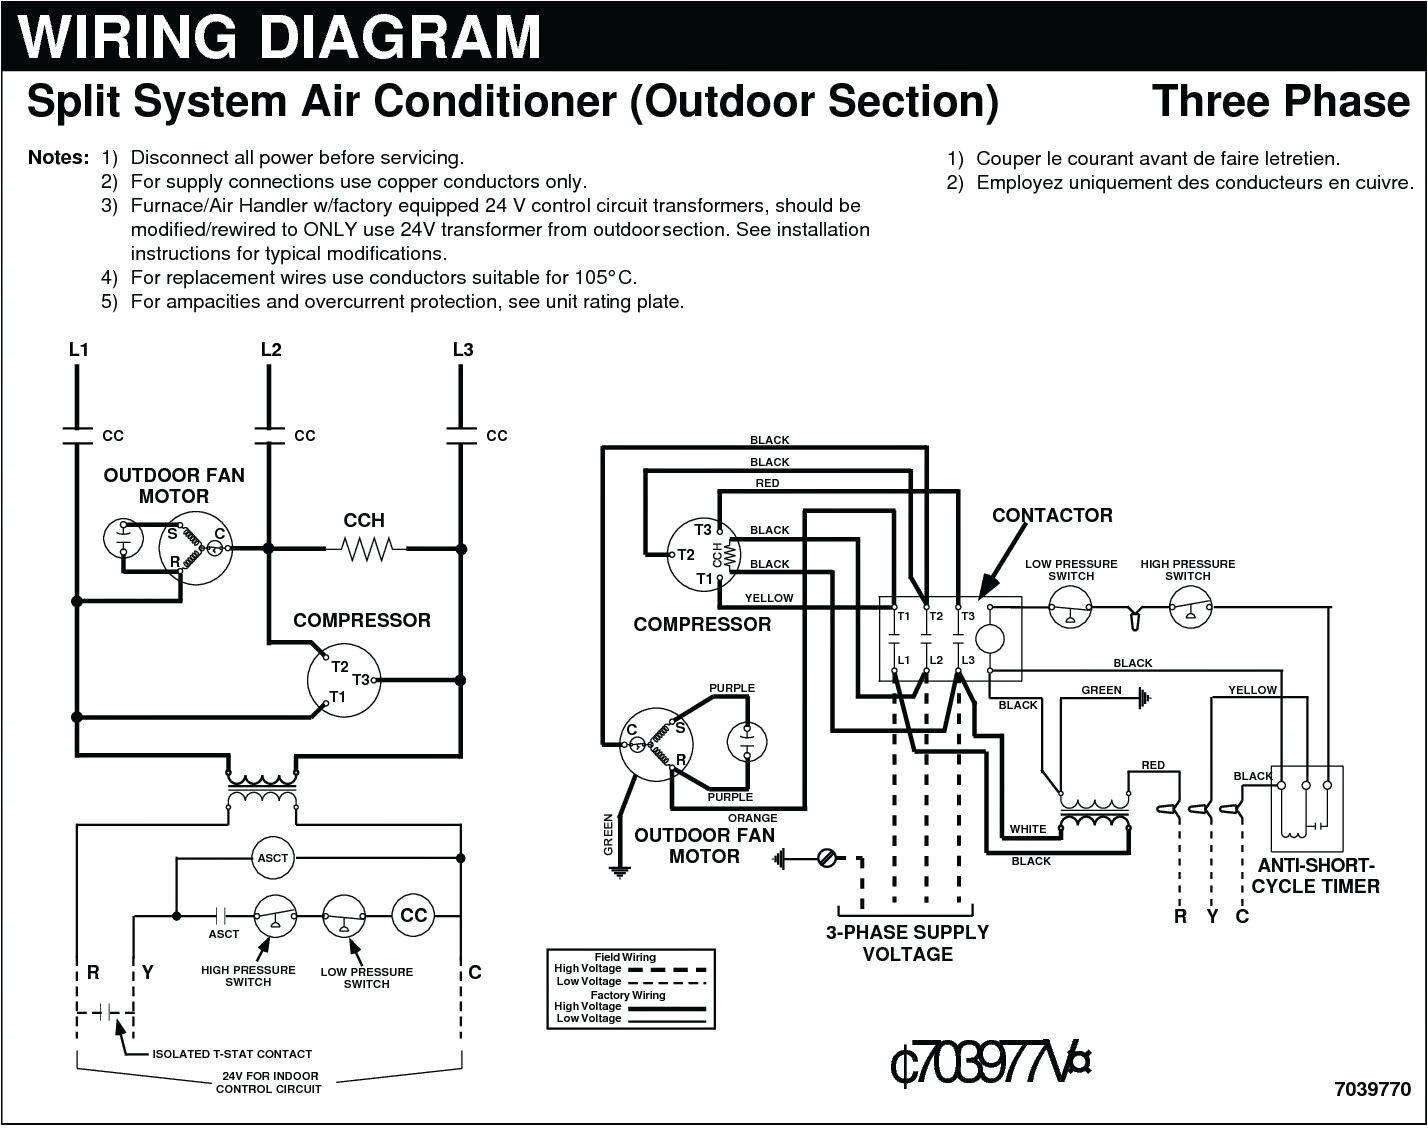 [DIAGRAM_38EU]  Coleman Furnace Wiring Diagram Heat And Air 005253 Diagram Base Website Air  005253 - VENNDIAGRAMHELP.SPEAKEASYBARI.IT | Fraser Johnston Furnace Wiring Diagram |  | Diagram Base Website Full Edition - speakeasybari.it